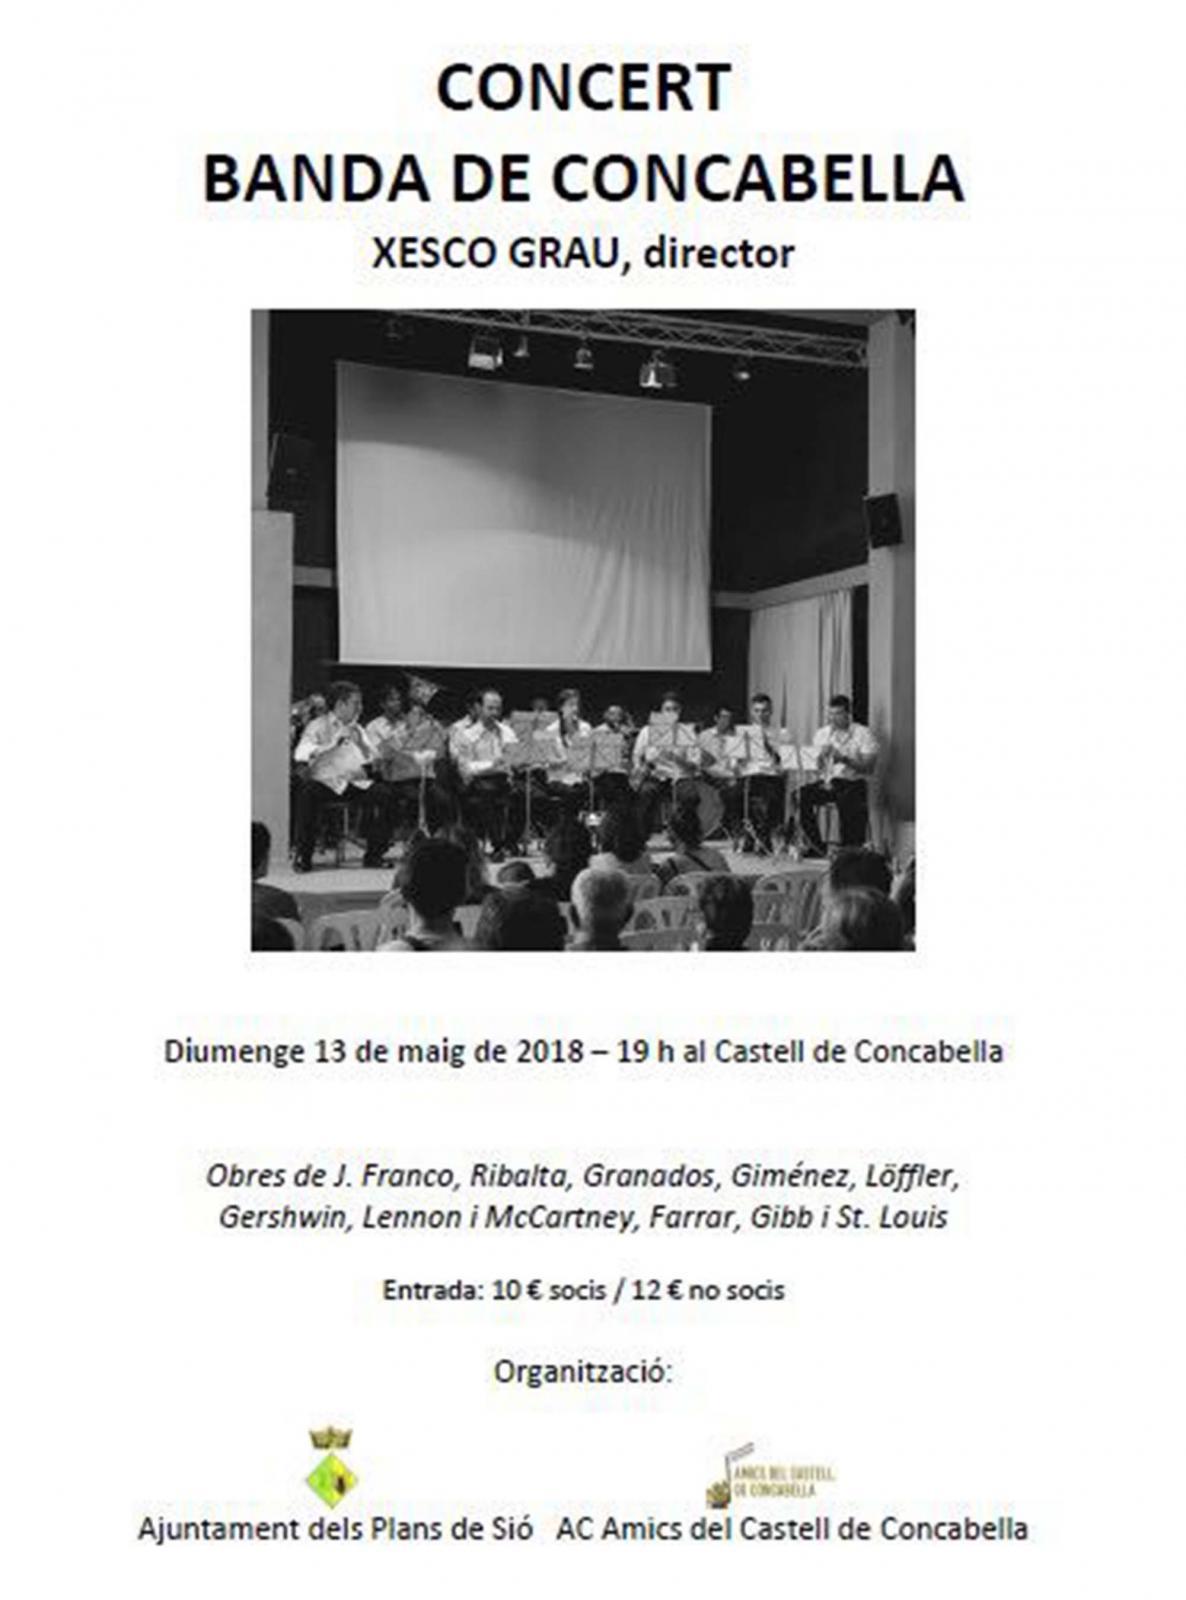 Concert de la Banda de Concabella